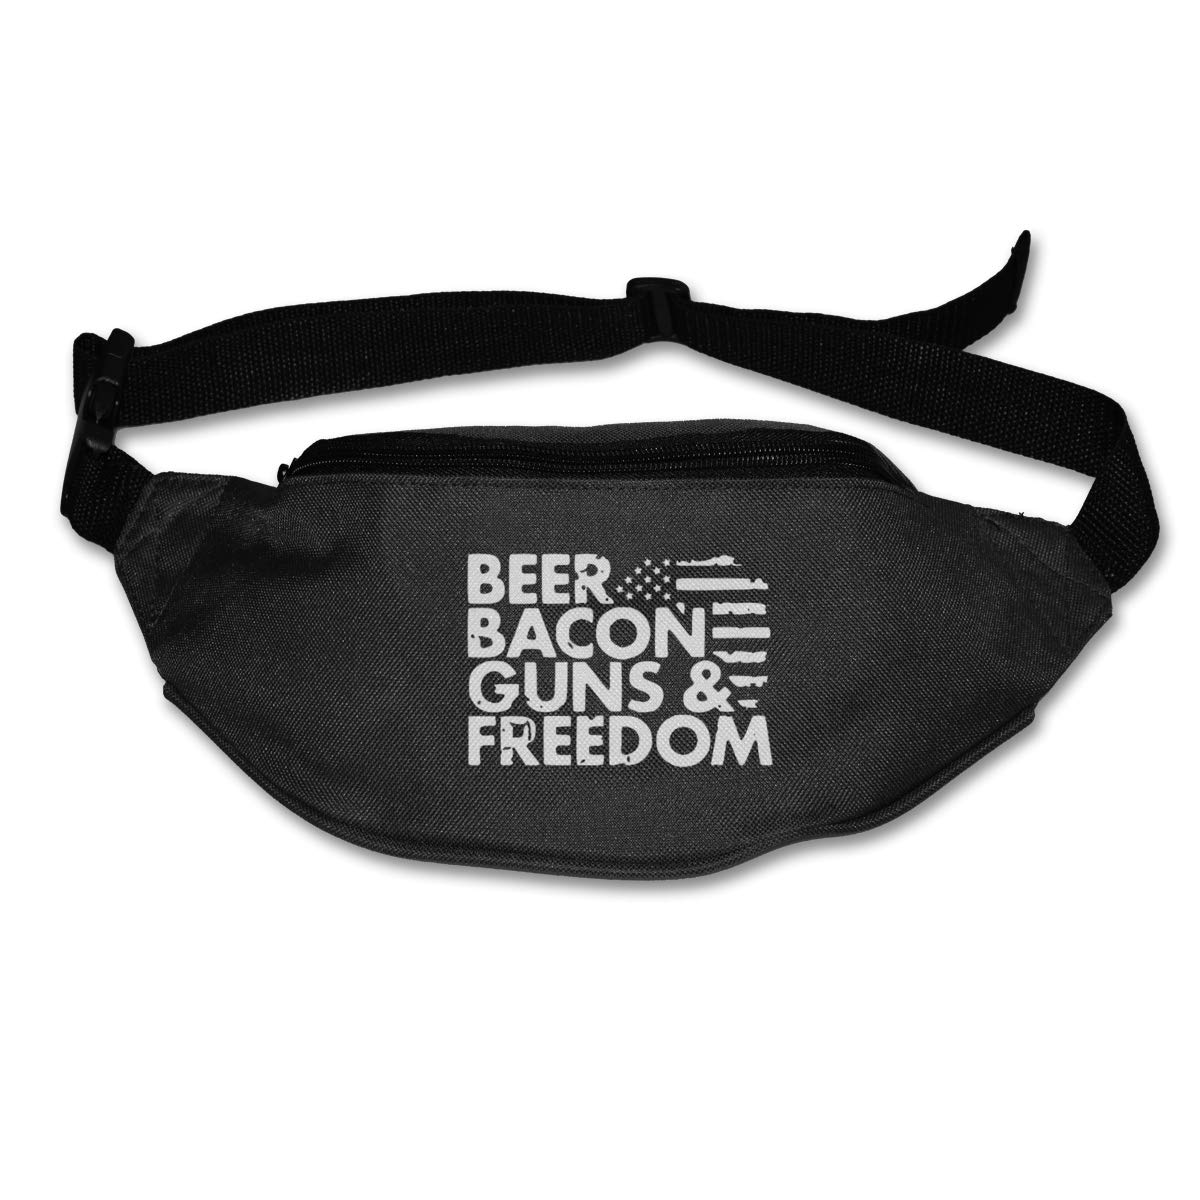 Beer Bacon Guns /& Freedom Sport Waist Bag Fanny Pack Adjustable For Travel